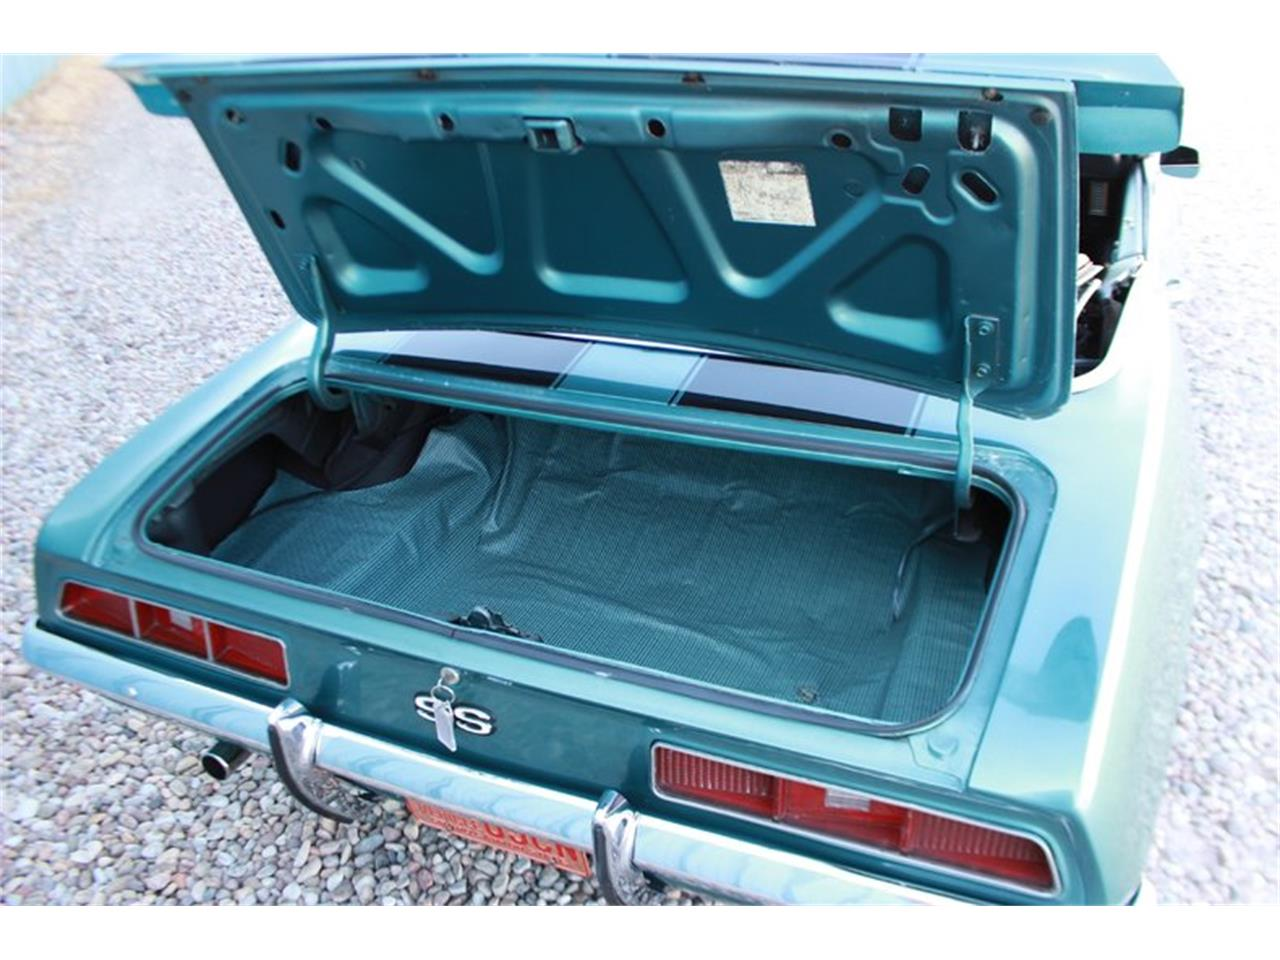 Large Picture of '69 Chevrolet Camaro located in Vernal Utah - $45,000.00 - LEAX